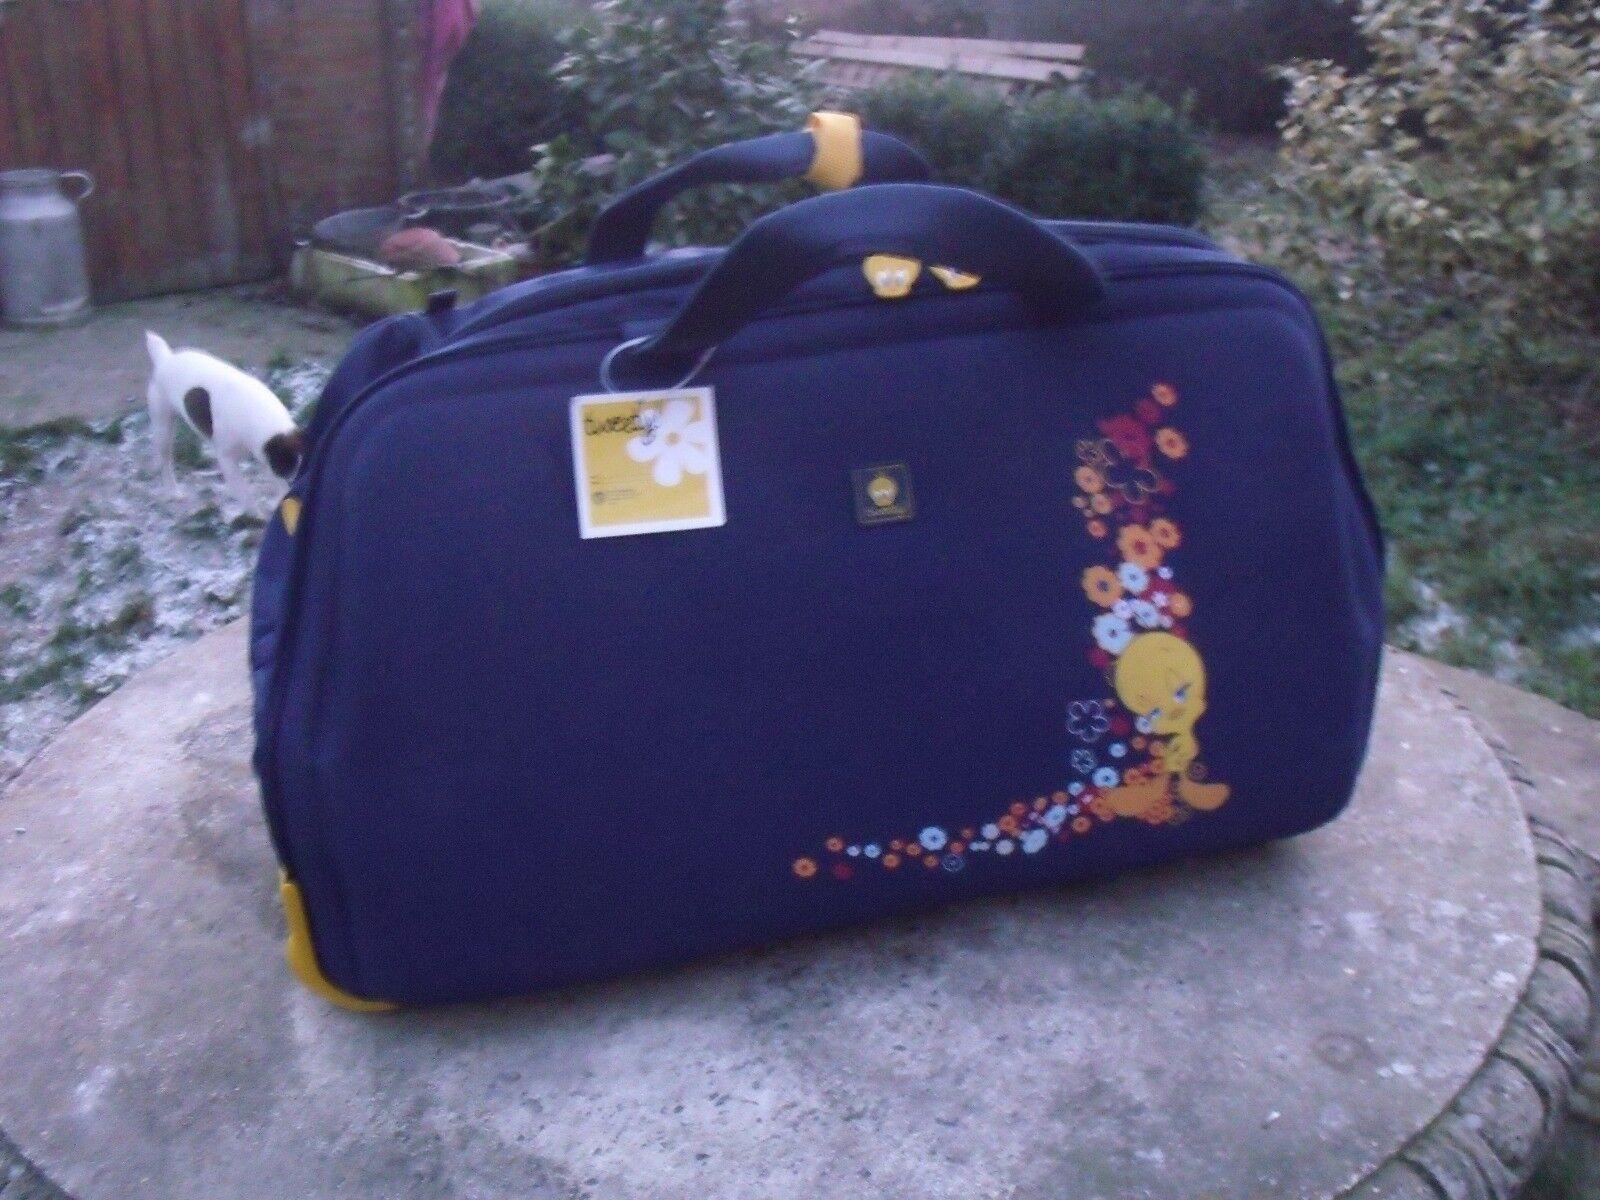 Sac de voyage valise Titi TWEETY NEUVE bleu Marine Garçon Mixte (grand) 1 sac